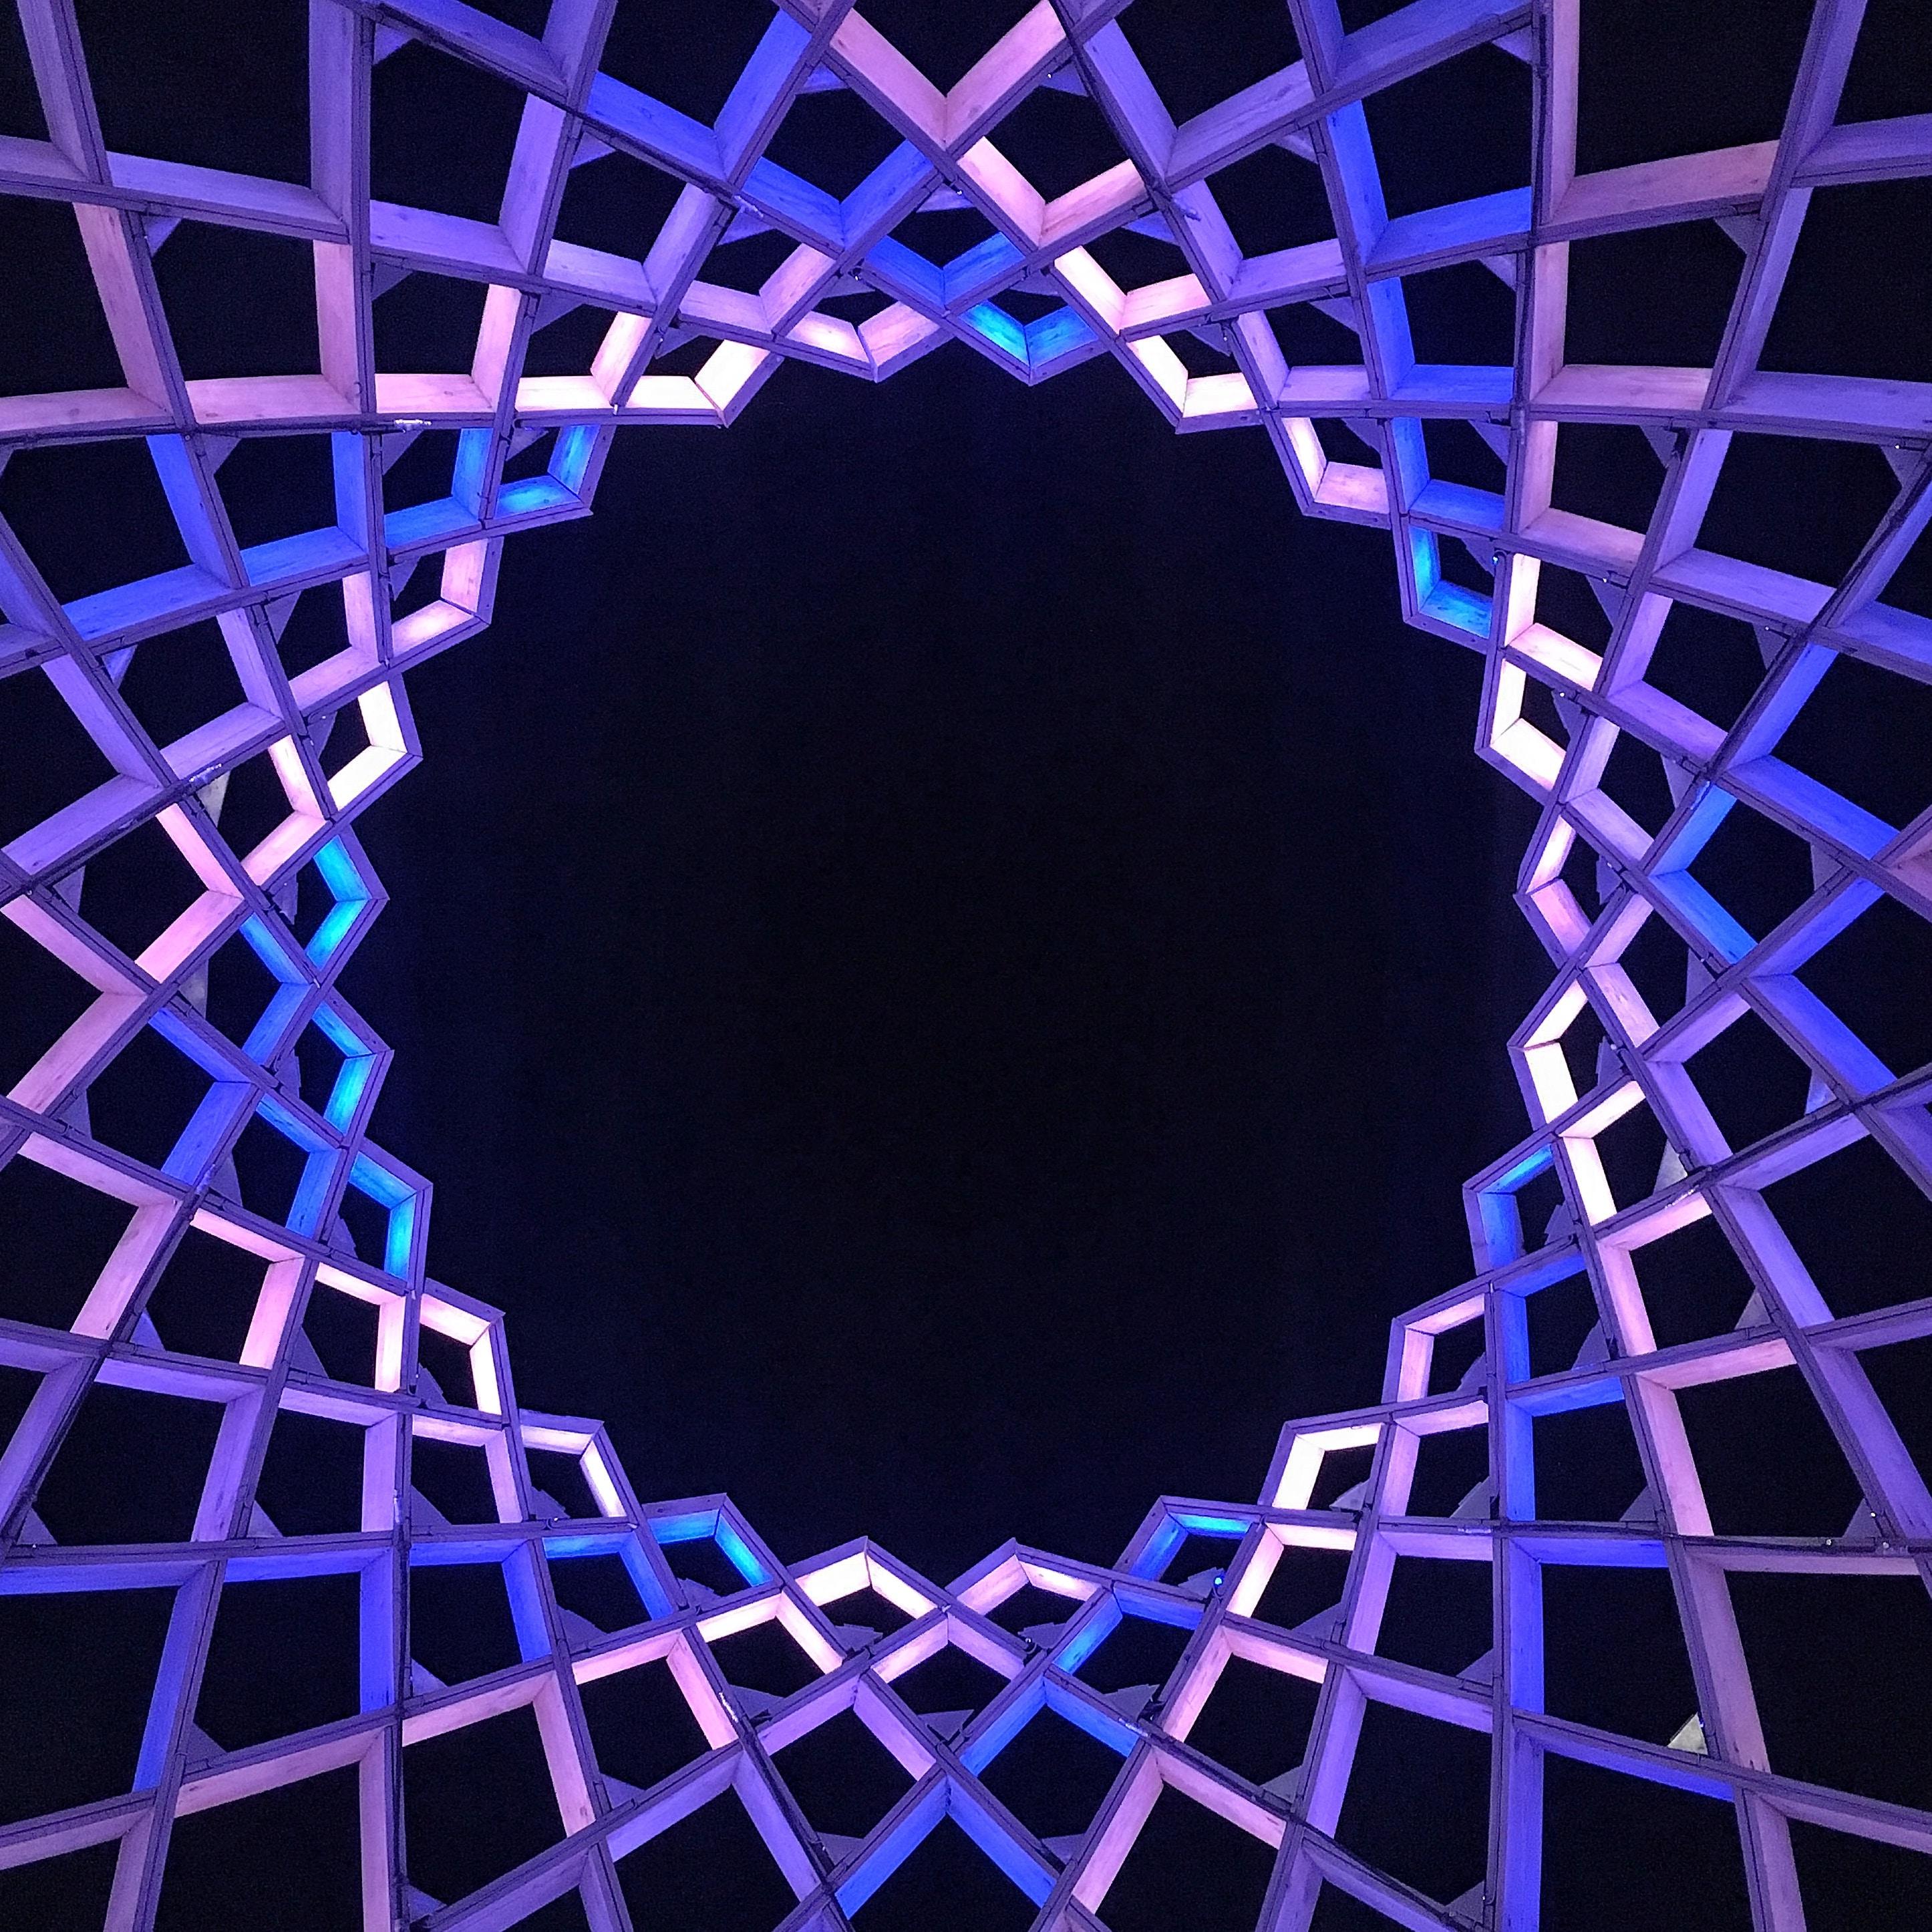 purple frame graphic